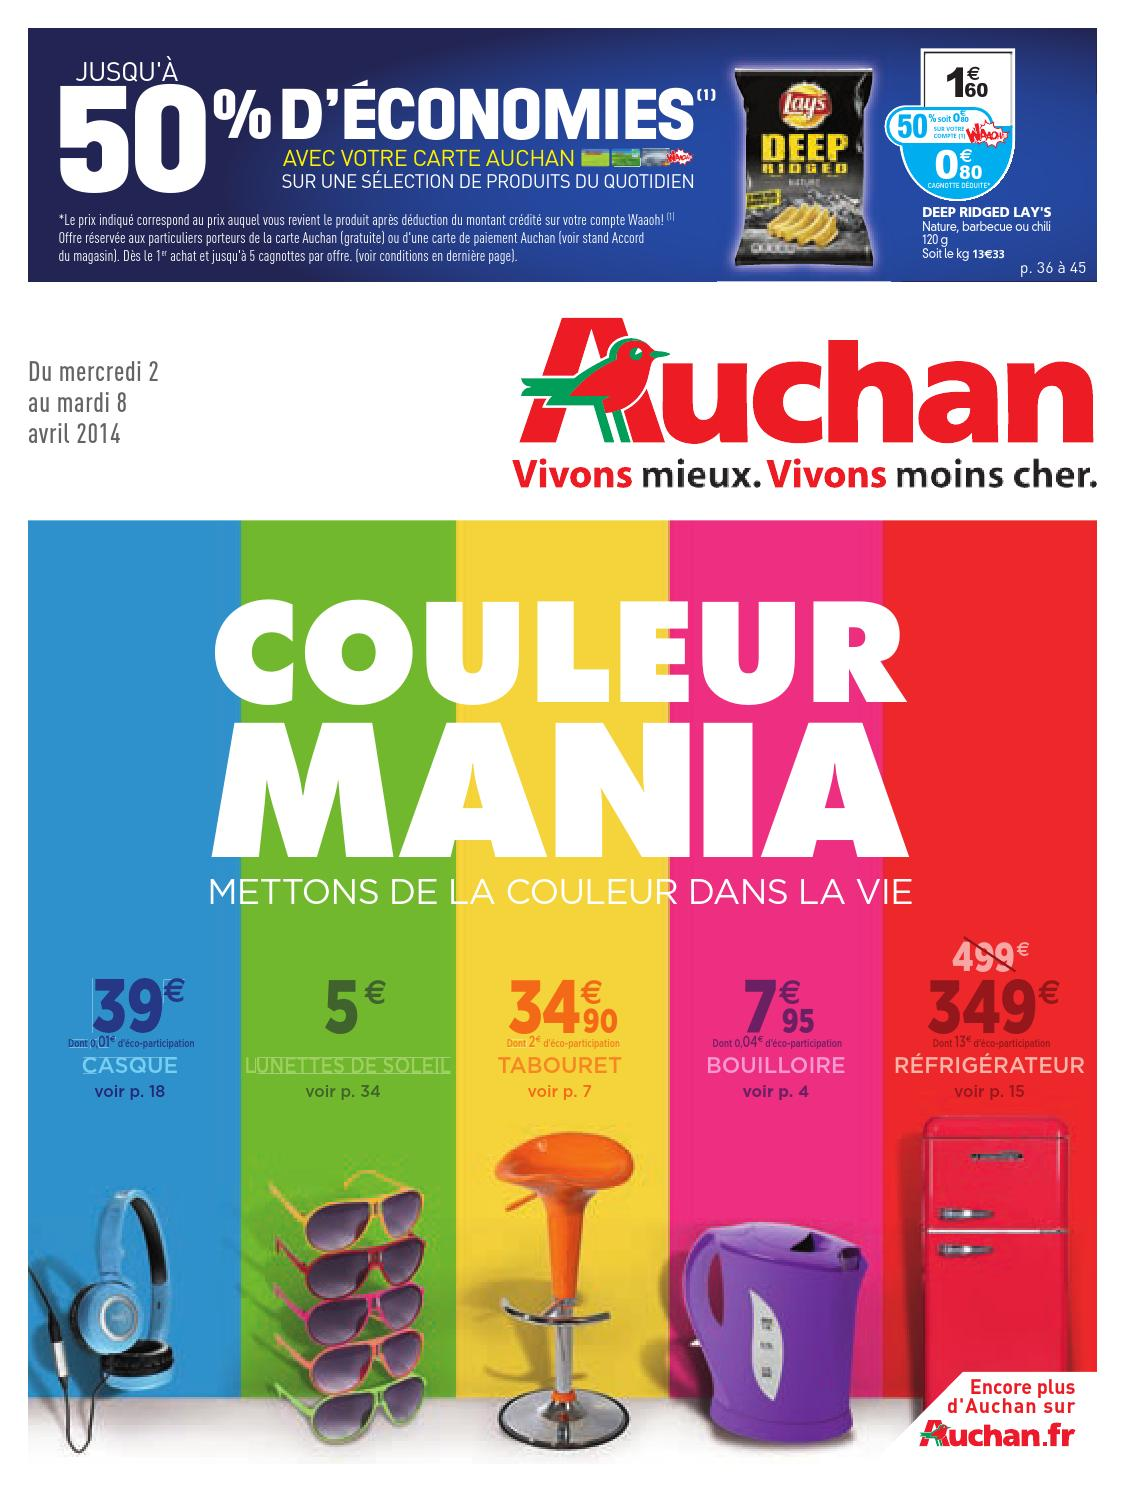 By Au Issuu 8 Anti Auchan Avril Catalogue Du 2 lF1KJu3T5c